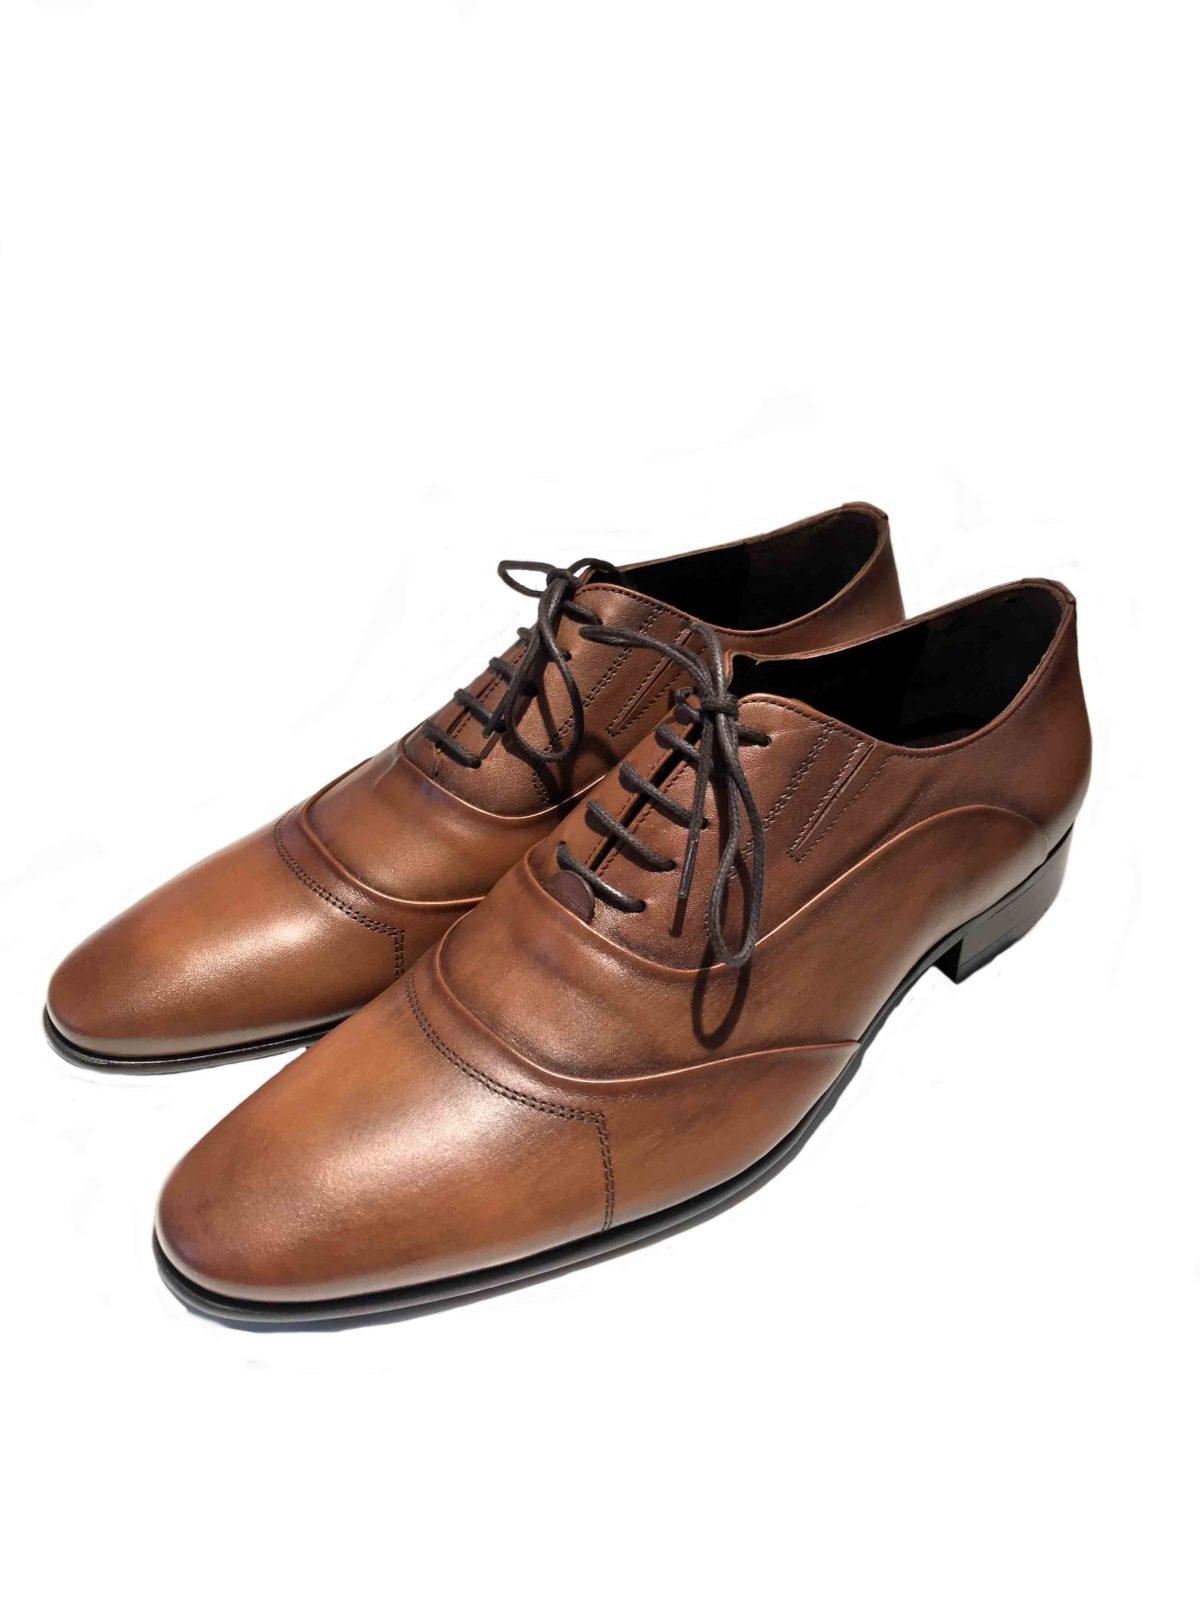 Ben Brown |BB 3980-9 Brown shoe